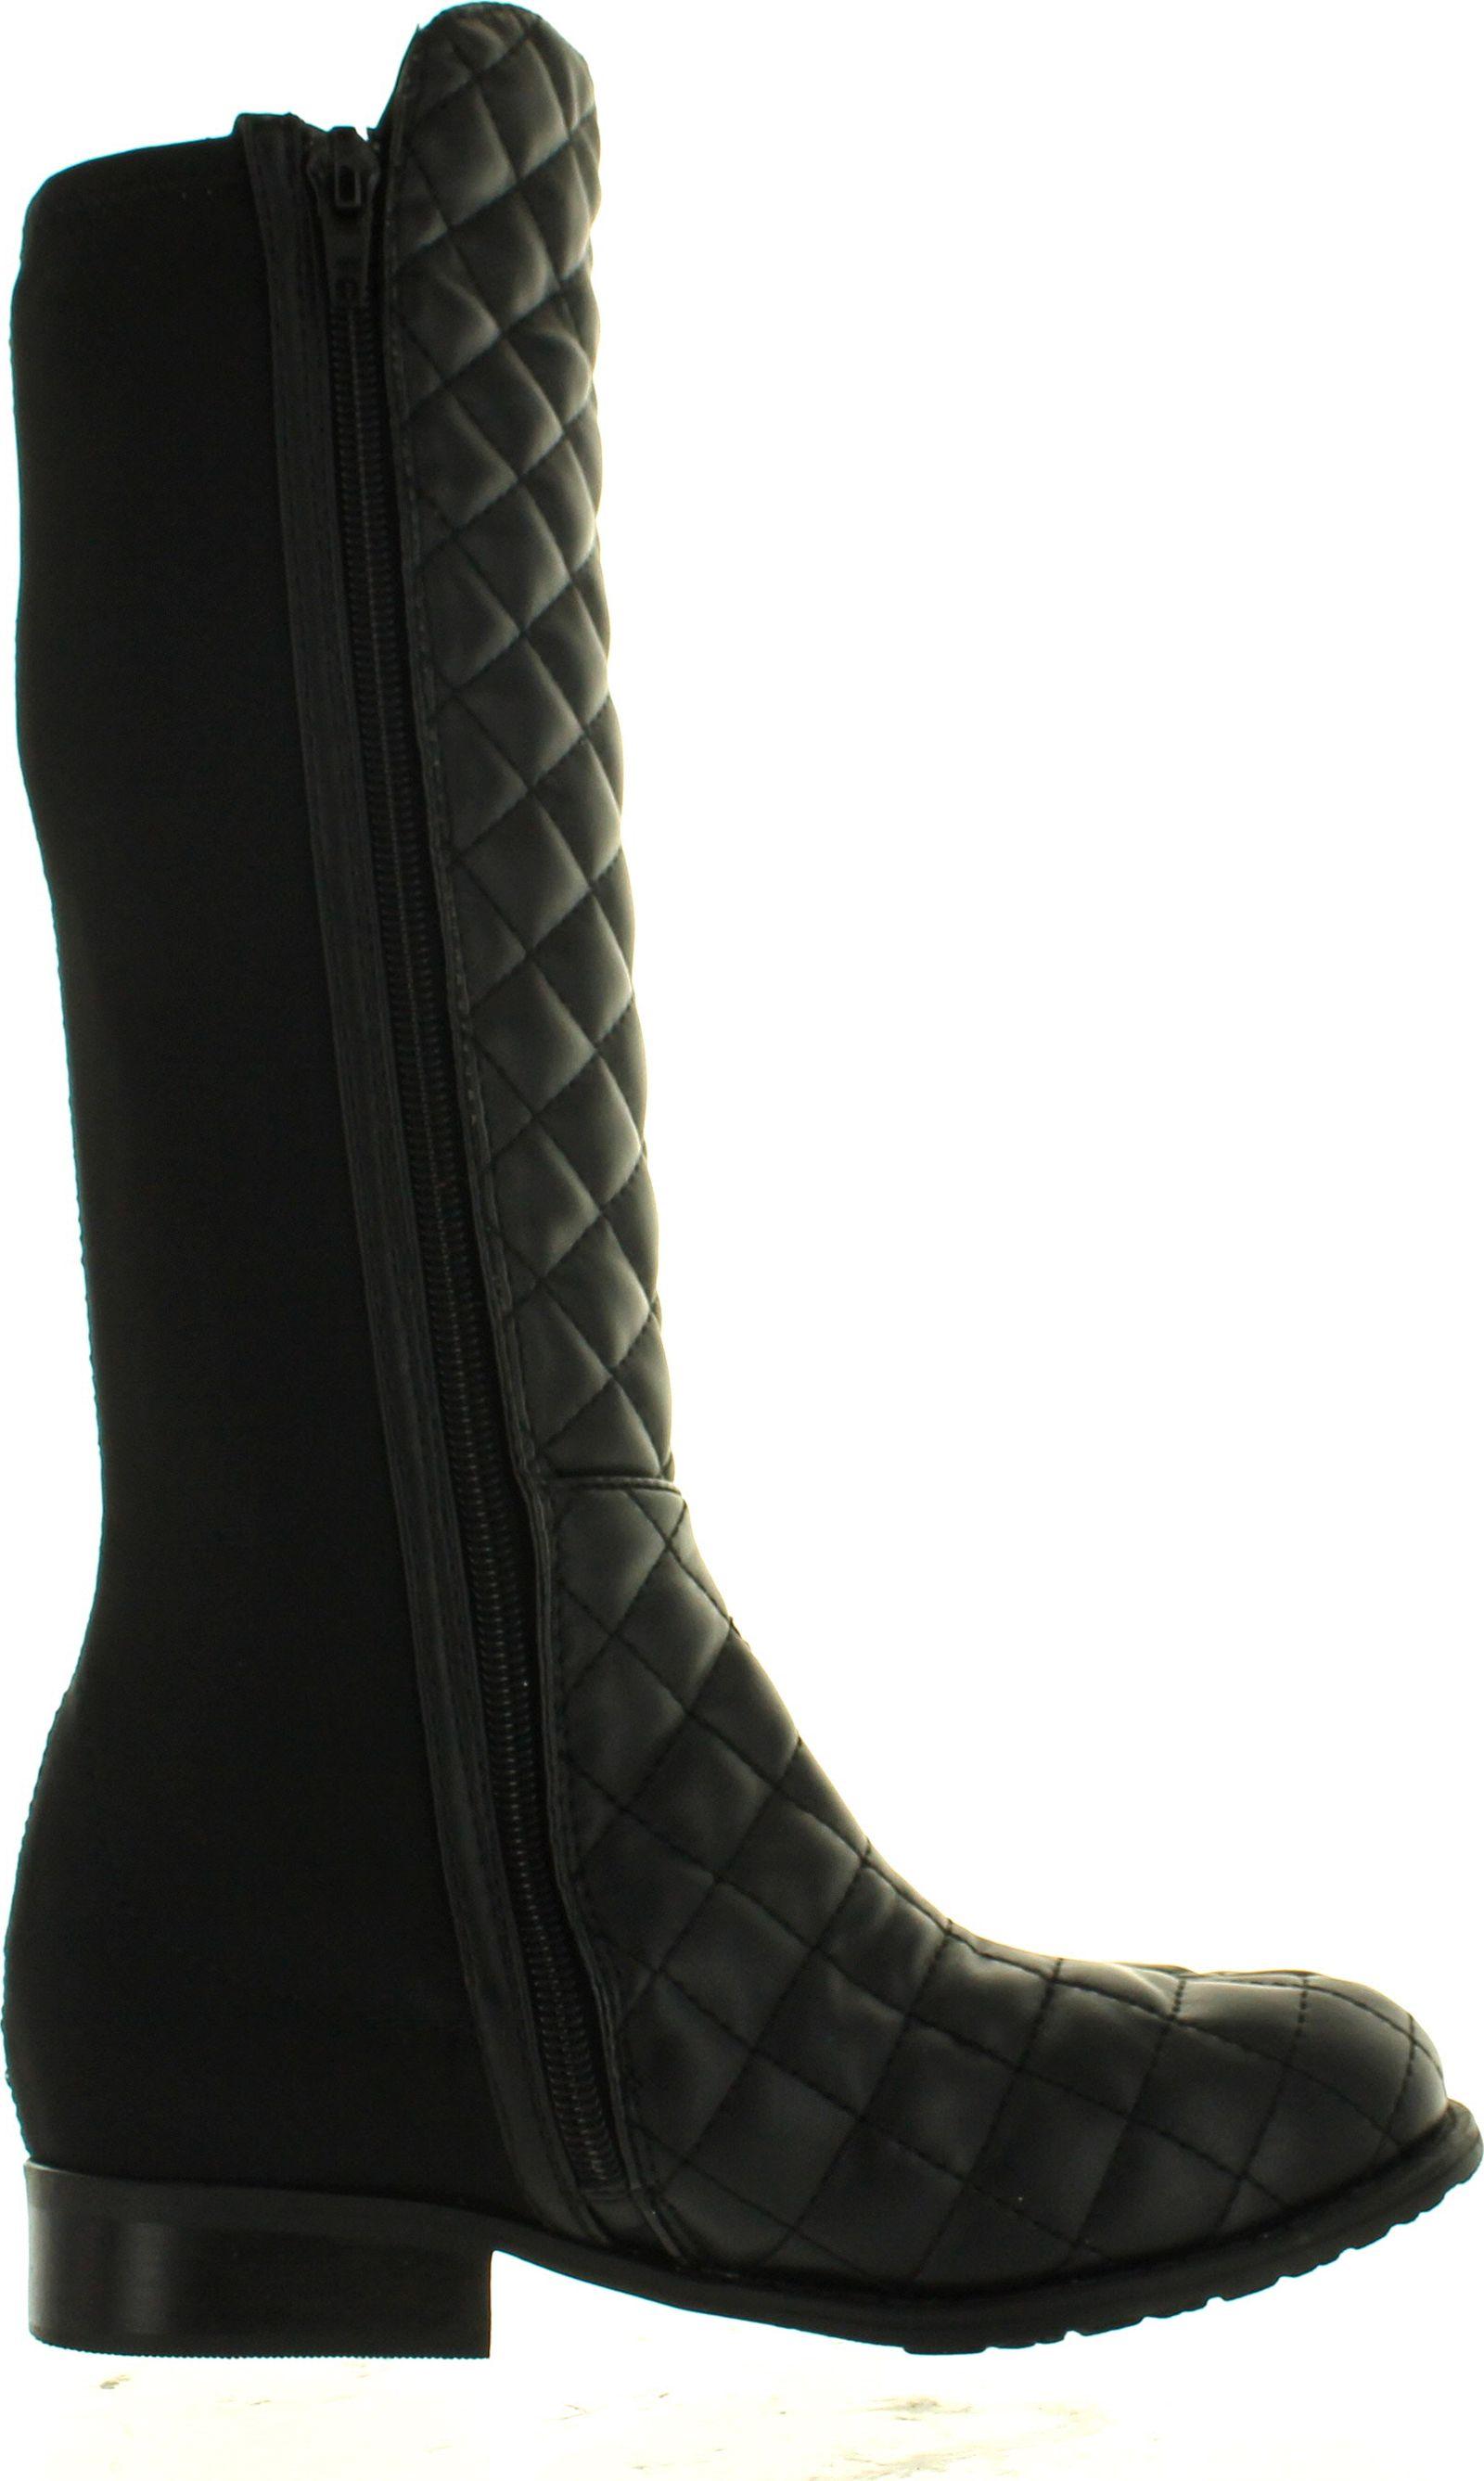 Stuart Weitzman Girls Youth 5050 Quilt Designer Tall Fashion Boots ... : stuart weitzman quilted boots - Adamdwight.com